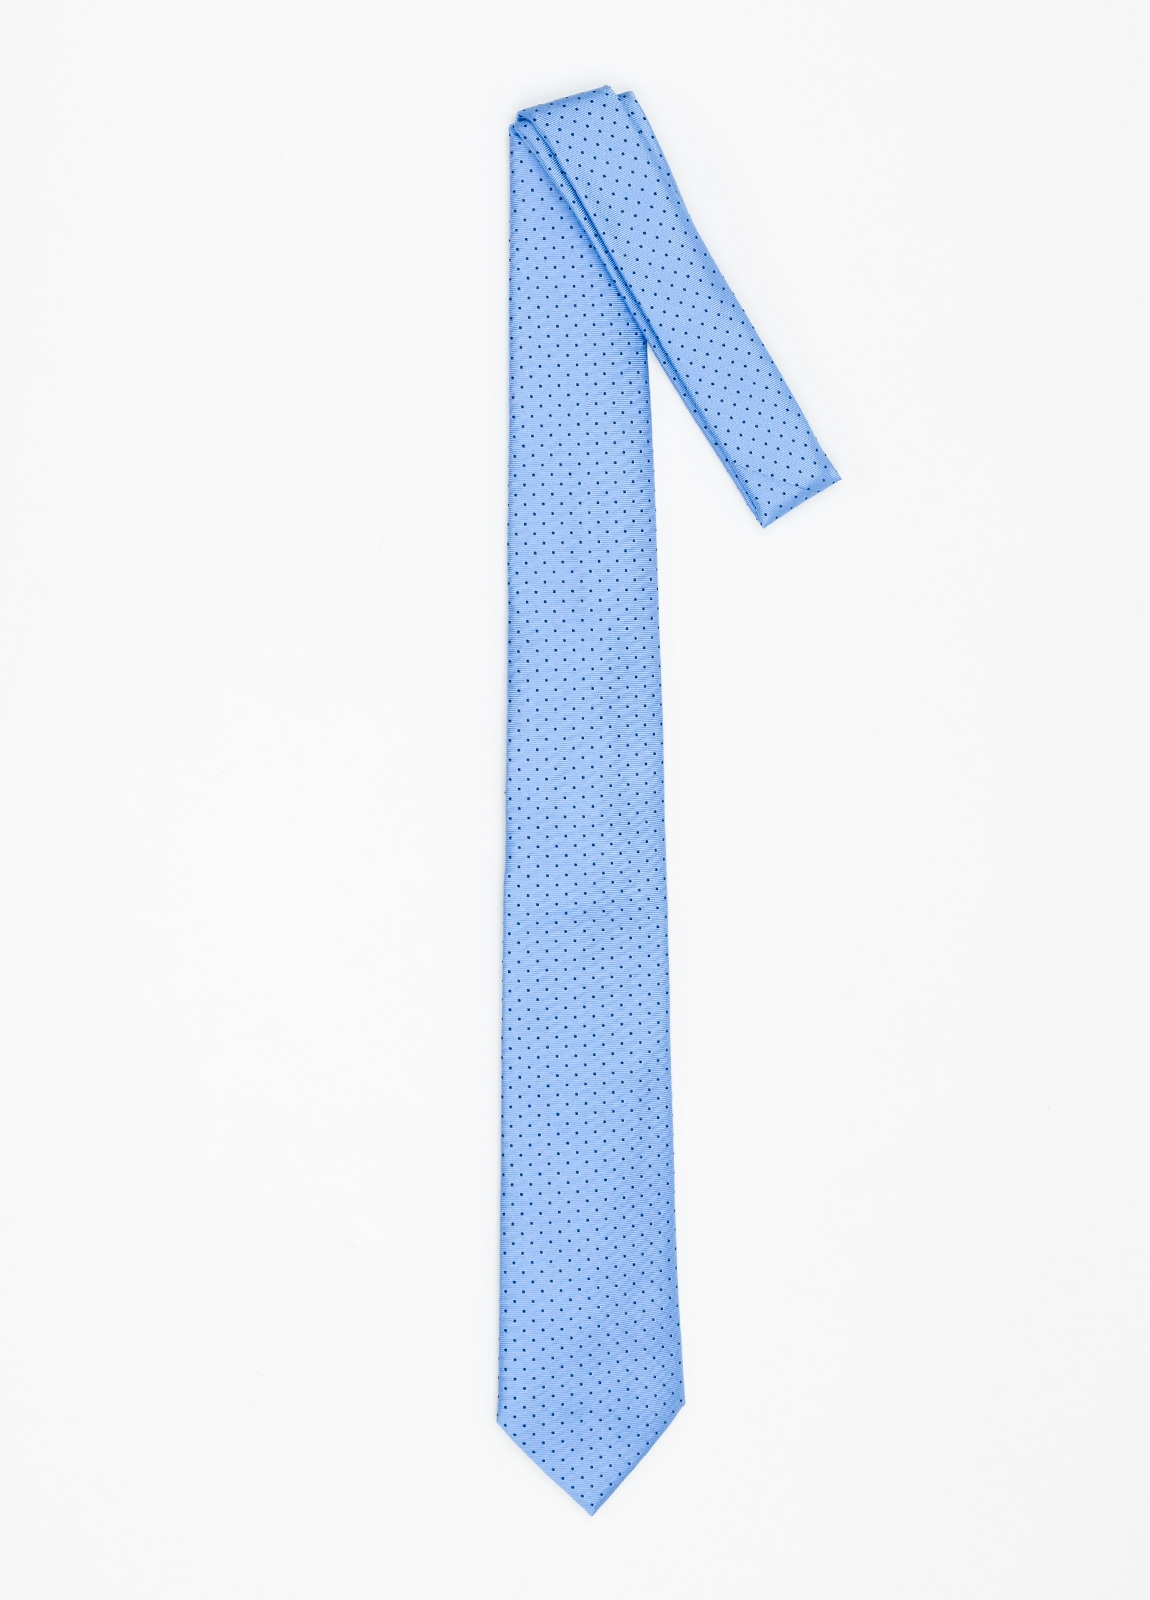 Corbata Formal Wear micro dibujo color azul celeste. Pala 7,5 cm. 100% Seda. - Ítem1